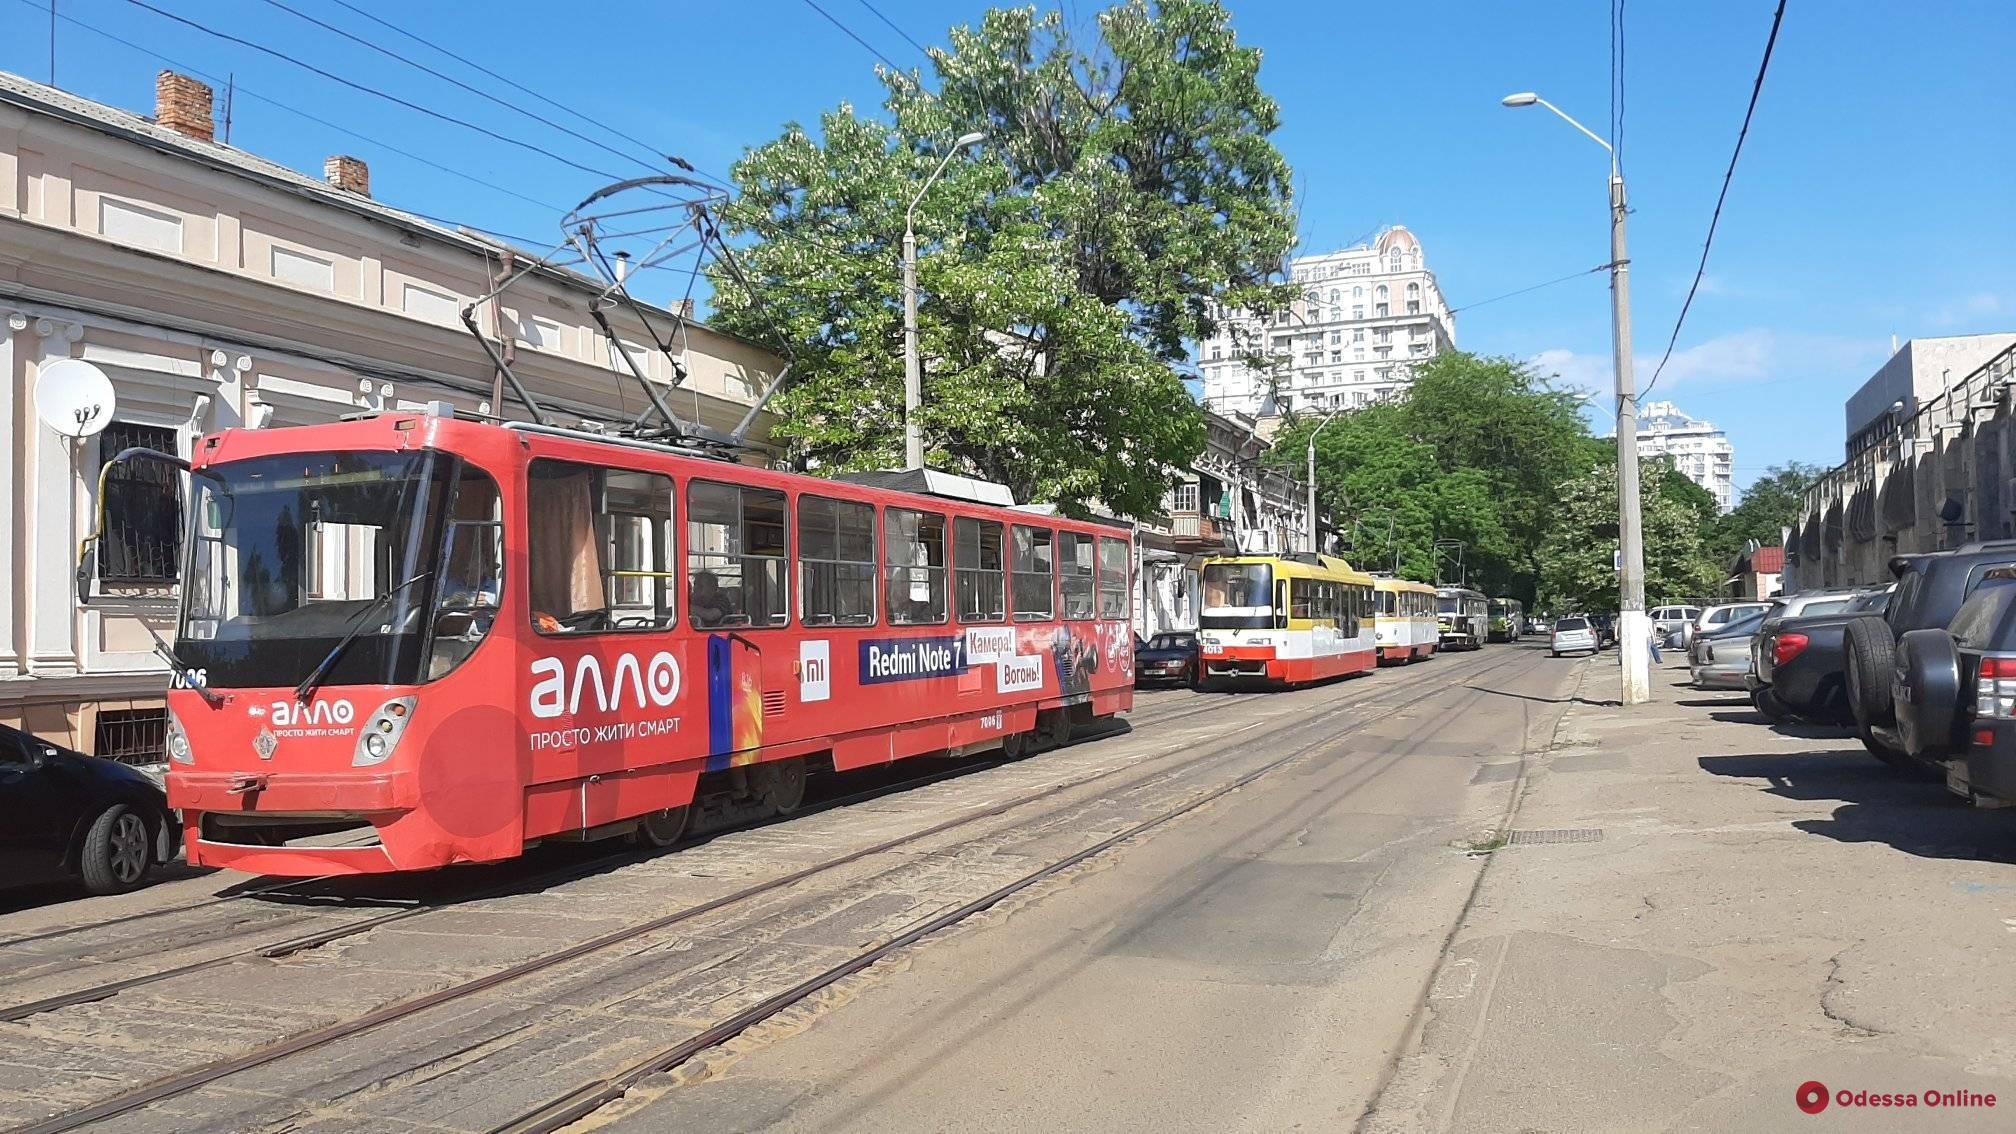 Из-за ДТП на Пантелеймоновской парализовано движение трамваев